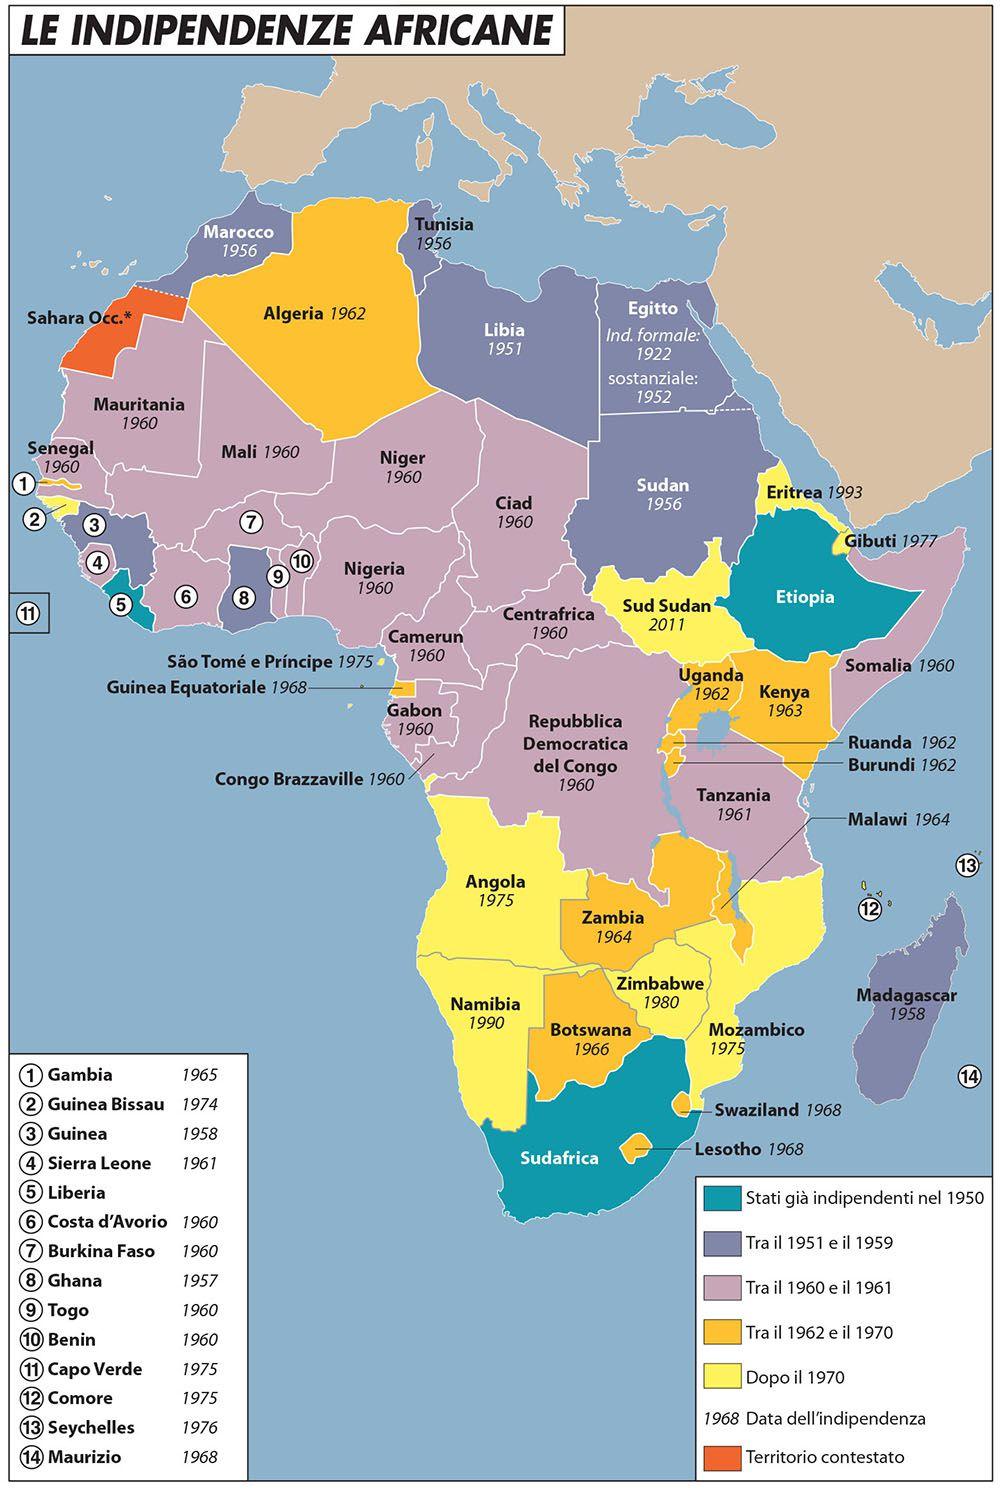 Indipendenze_africane_11/17